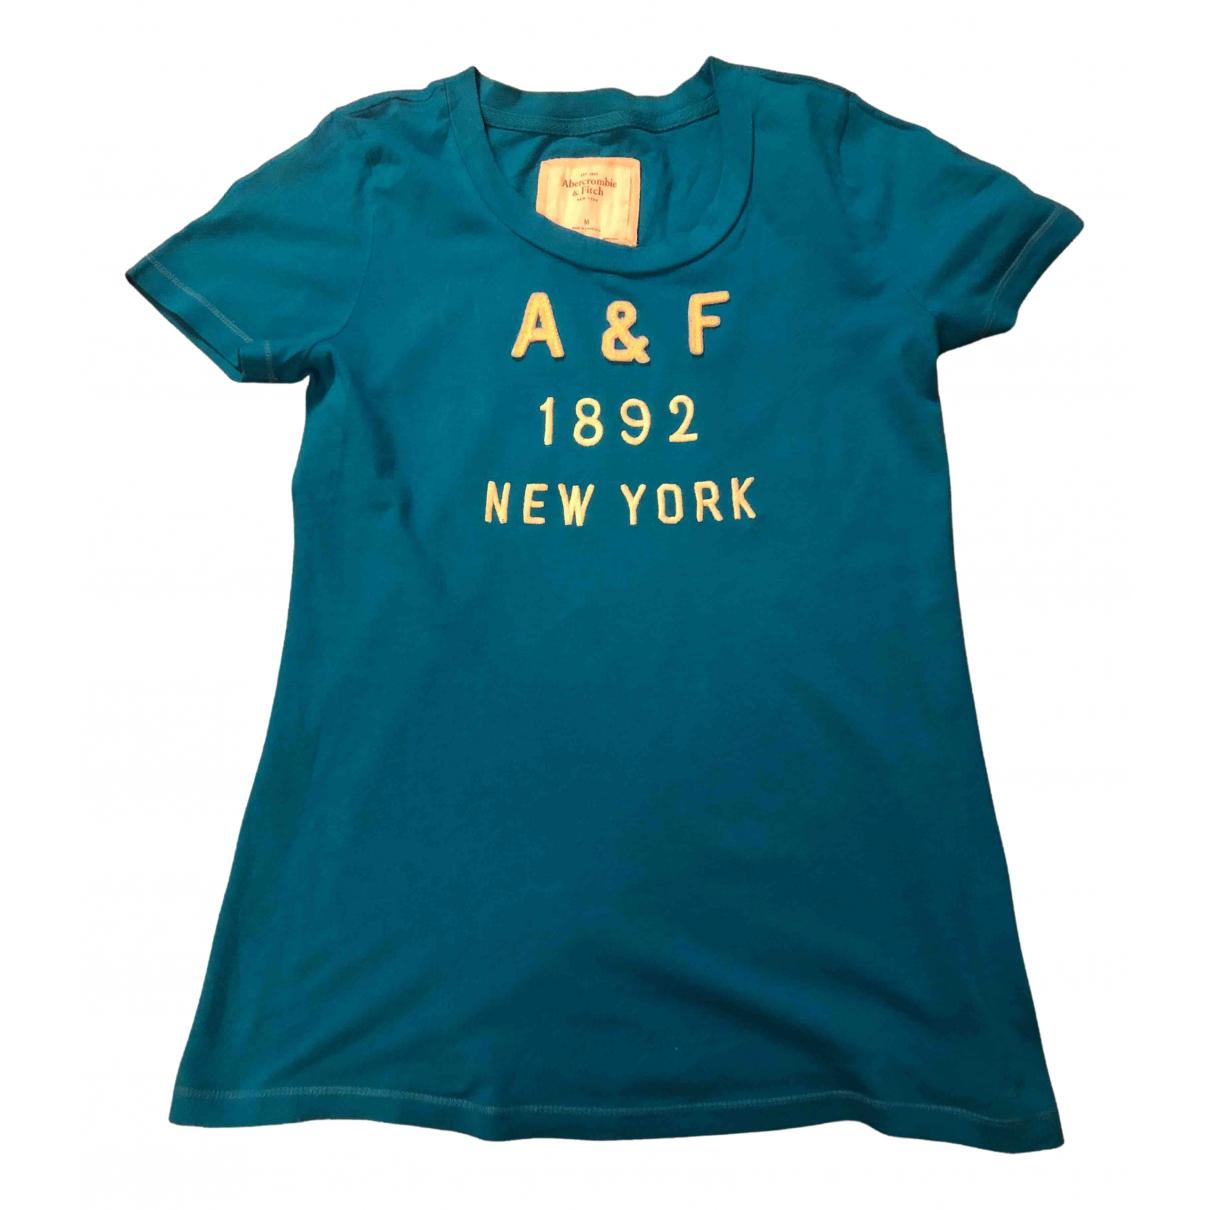 Camiseta Abercrombie & Fitch